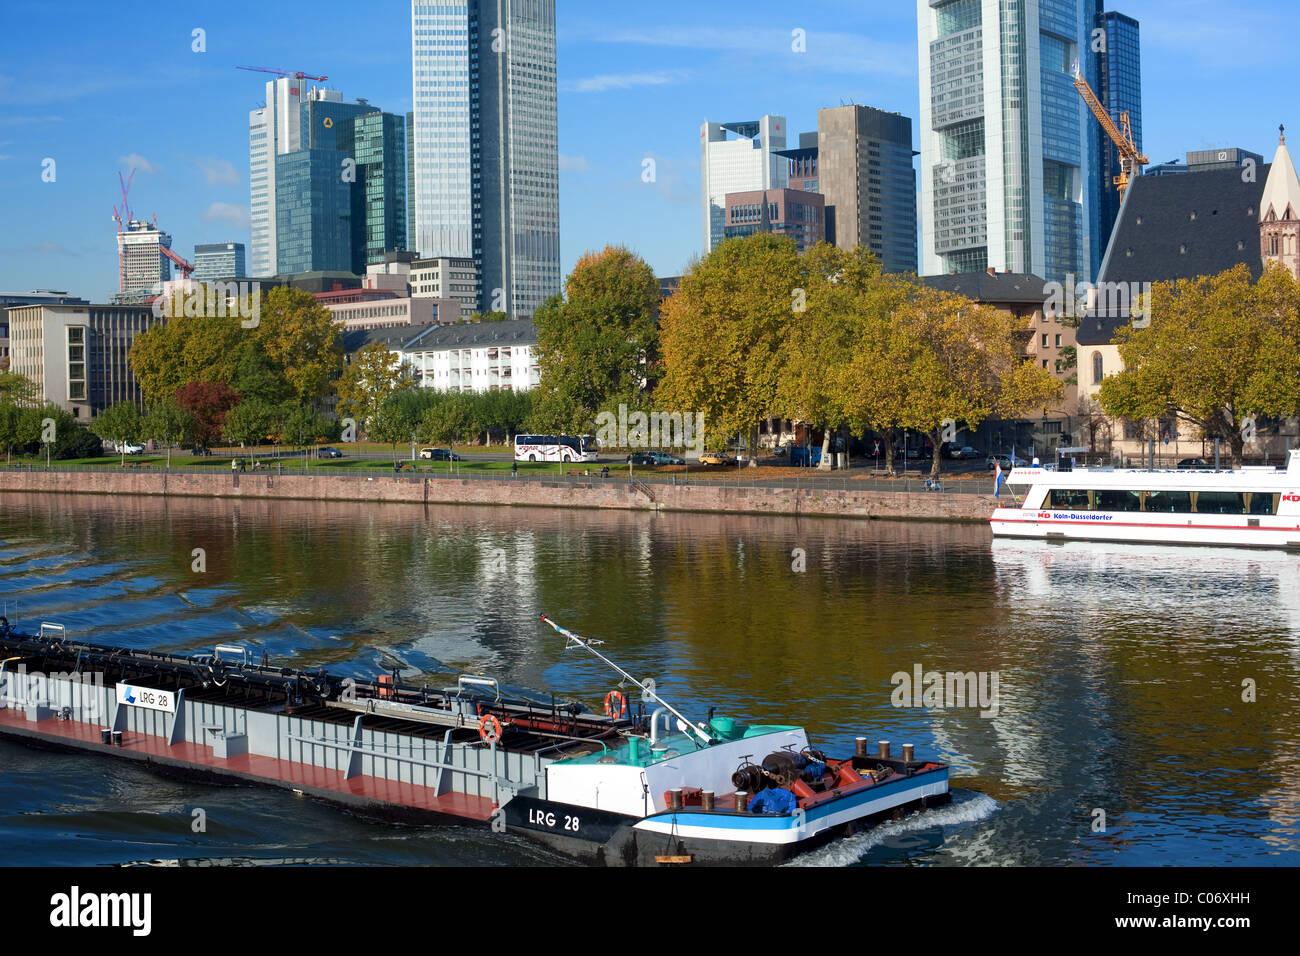 River Barge Passing The City Of Frankfurt On The Main River - Frankfurt river